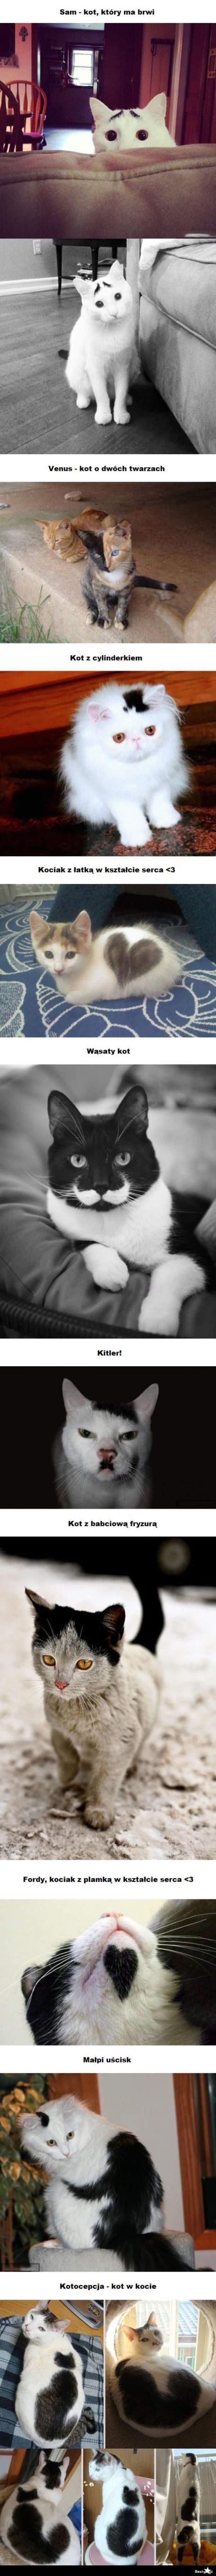 Wonderful <33 #cats #pets